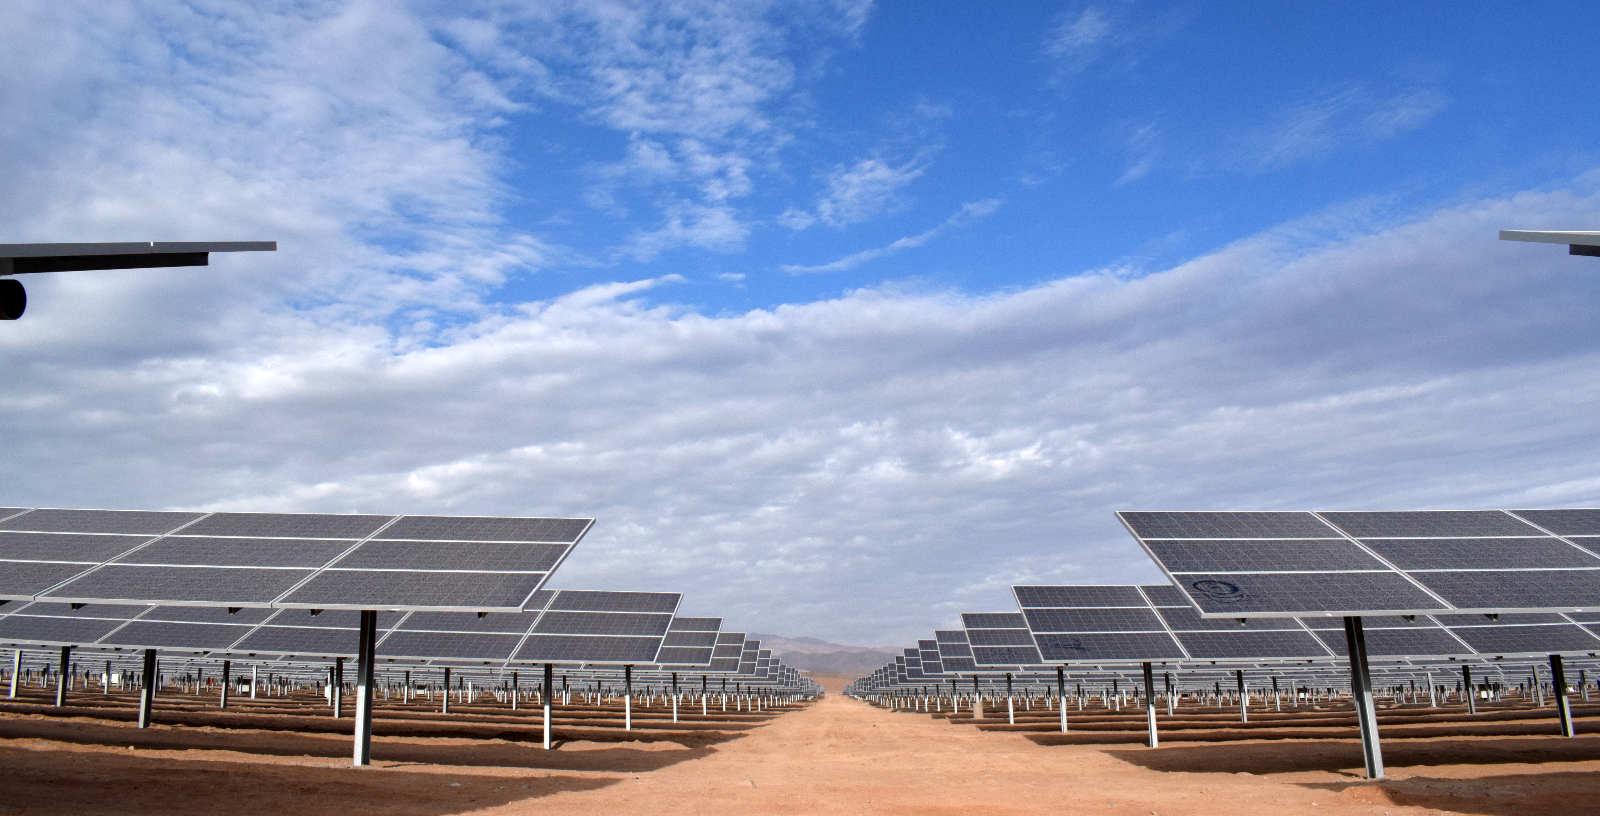 Intipampa_PV_Photovoltaic_Plant_Per__Engie_IDOM_1_1